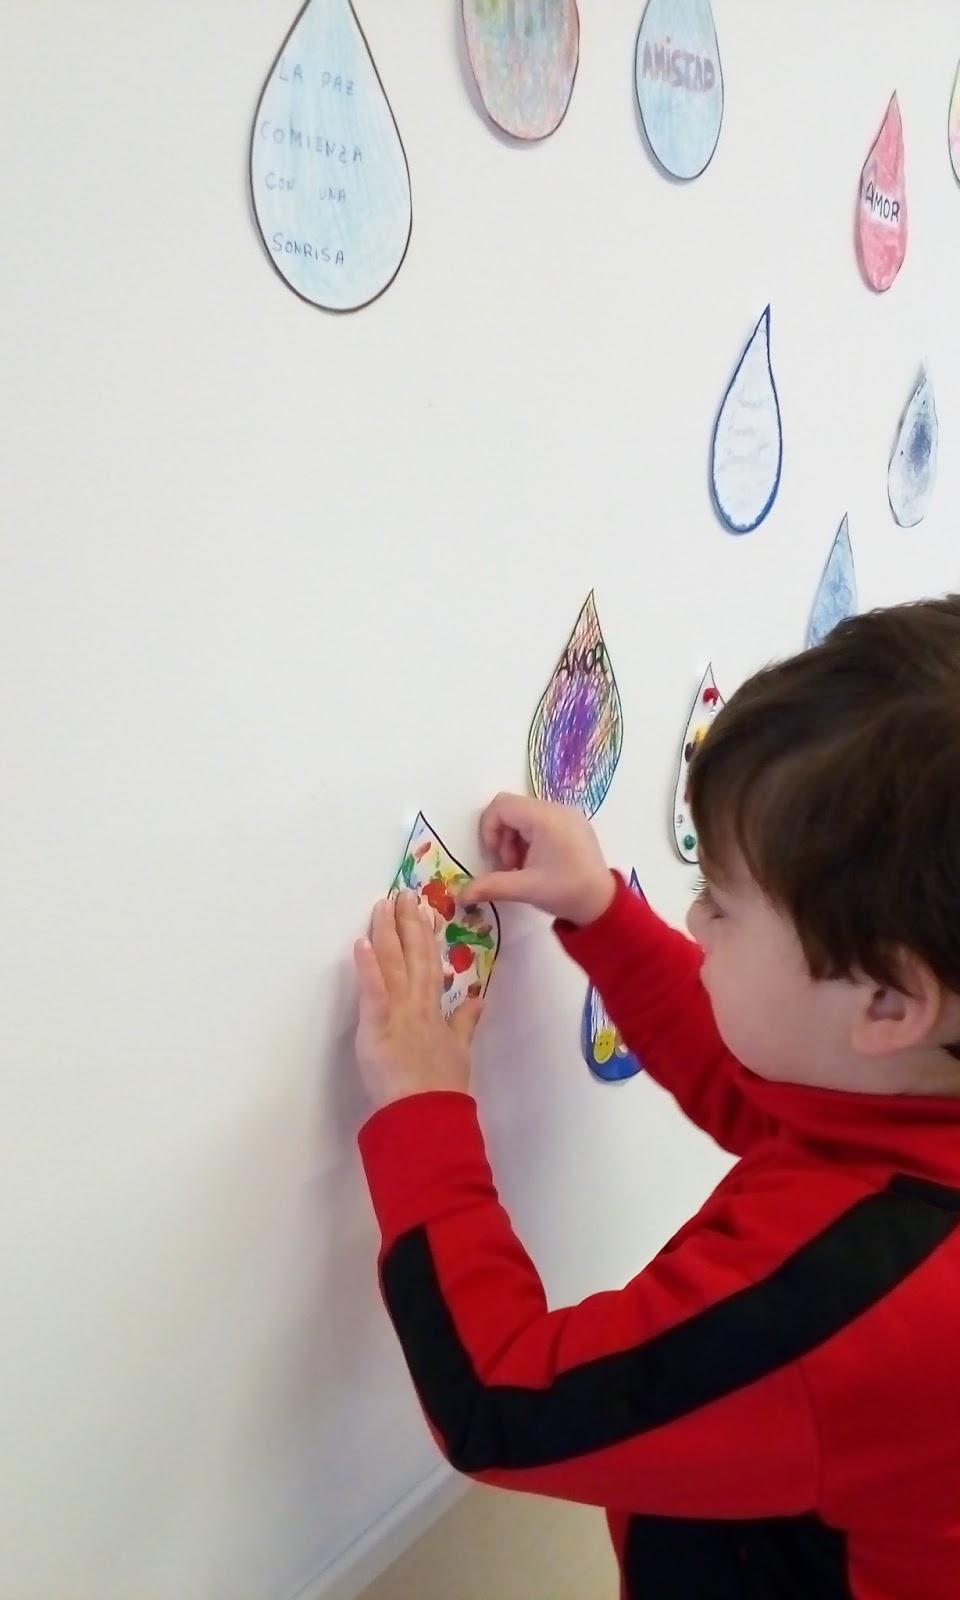 Escuela infantil garabatos enero 2018 - Garabatos mobiliario juvenil e infantil ...